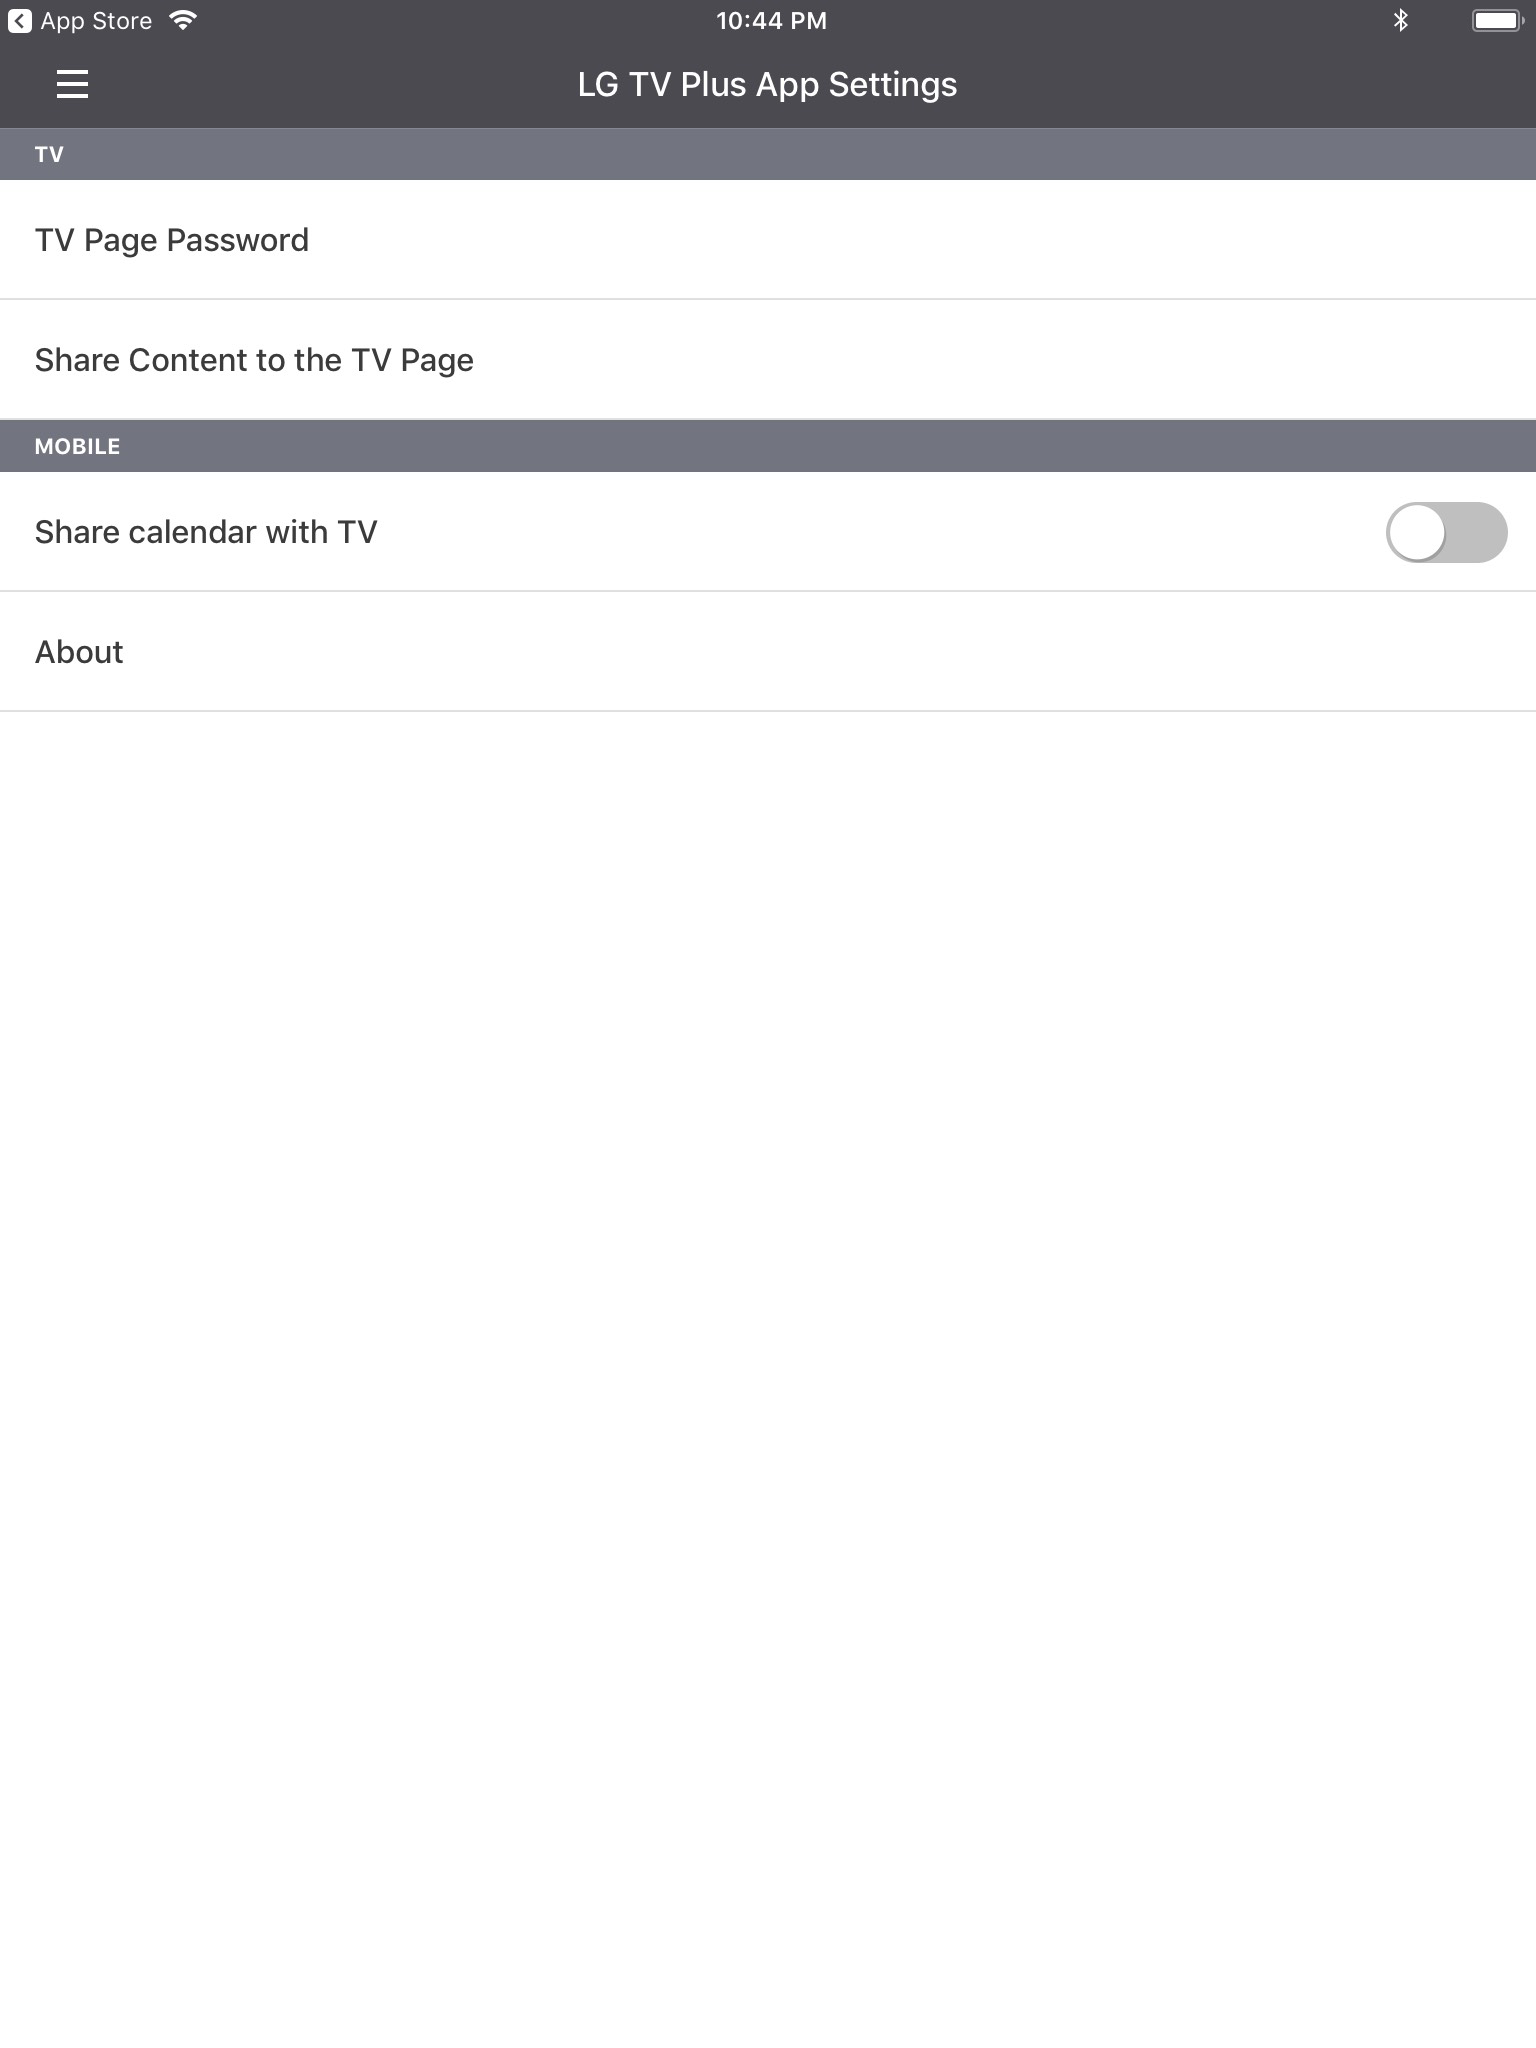 TV - LG TV Plus Remote App | LG USA Support